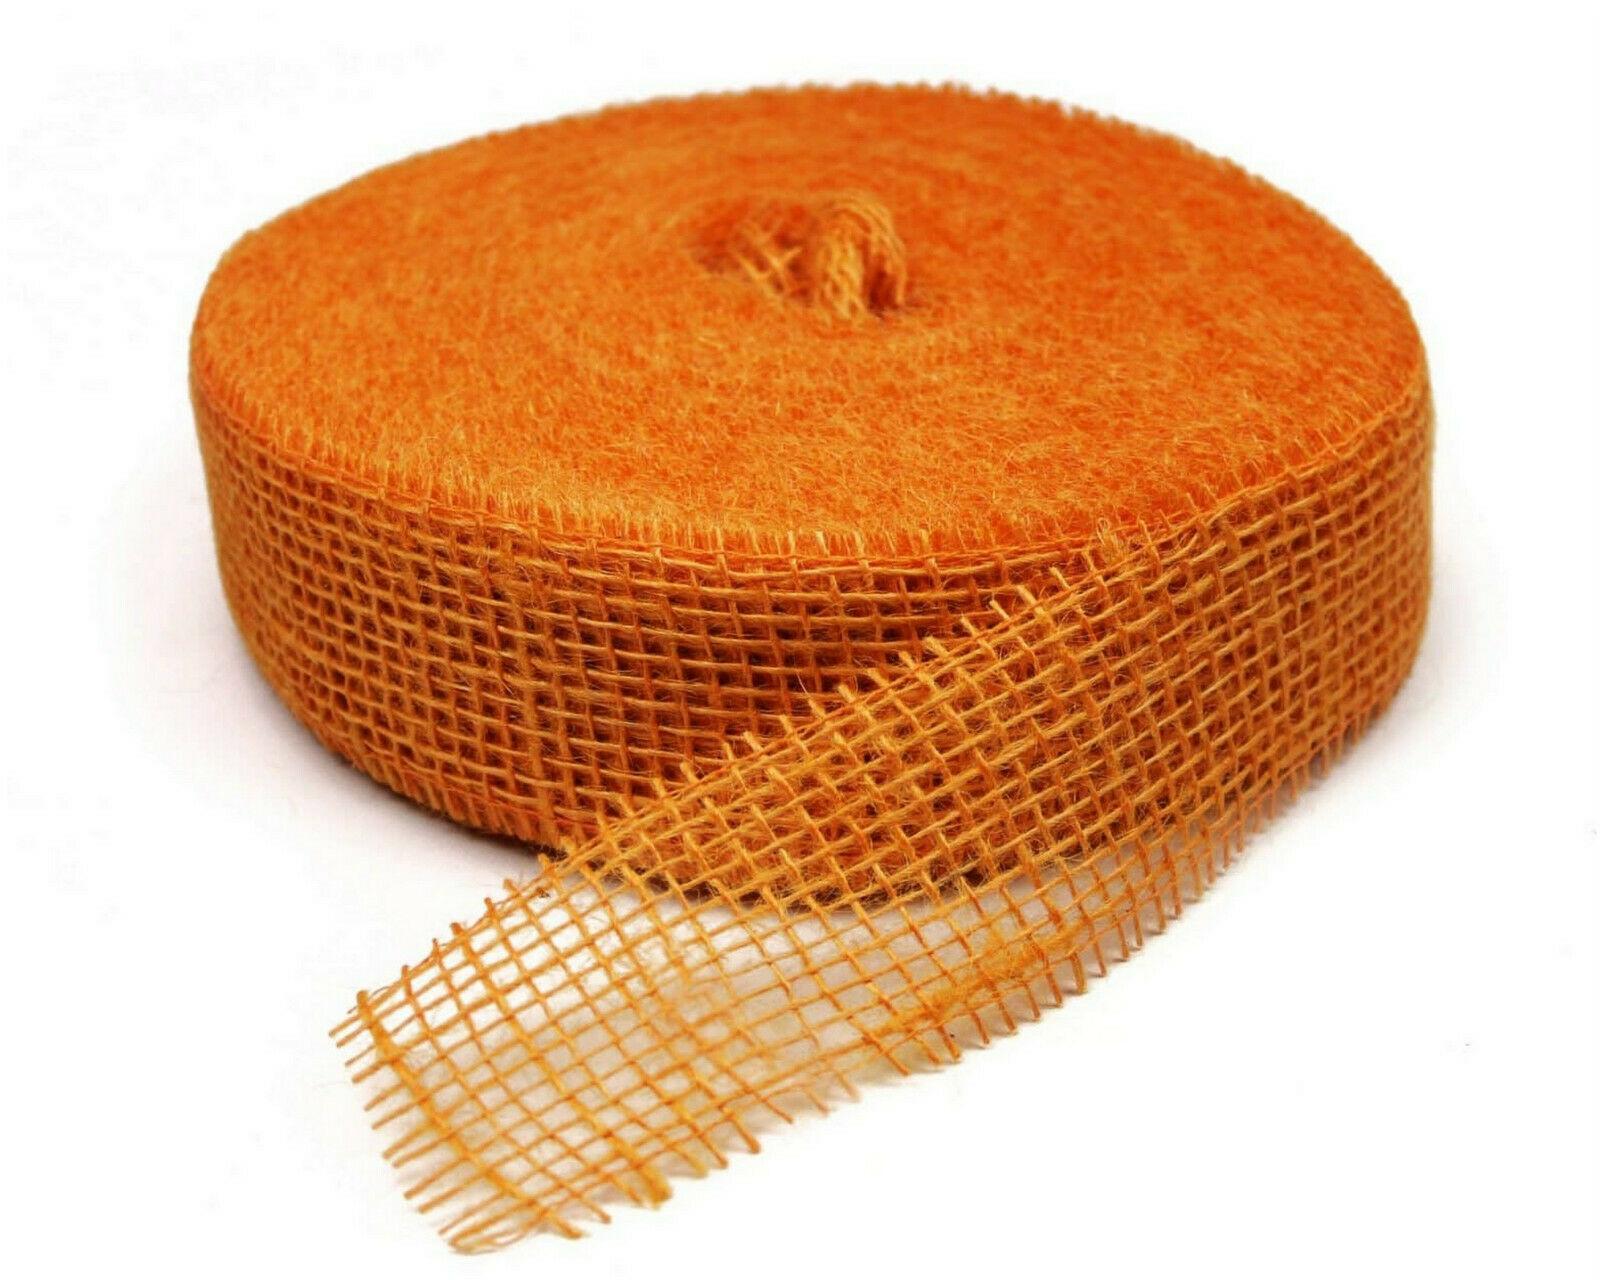 Juteband 40 m x 5 cm Dekoband ab 0,20 €/m Jute Rolle Schleifenband Rupfen Band - orange (hart)  40 m